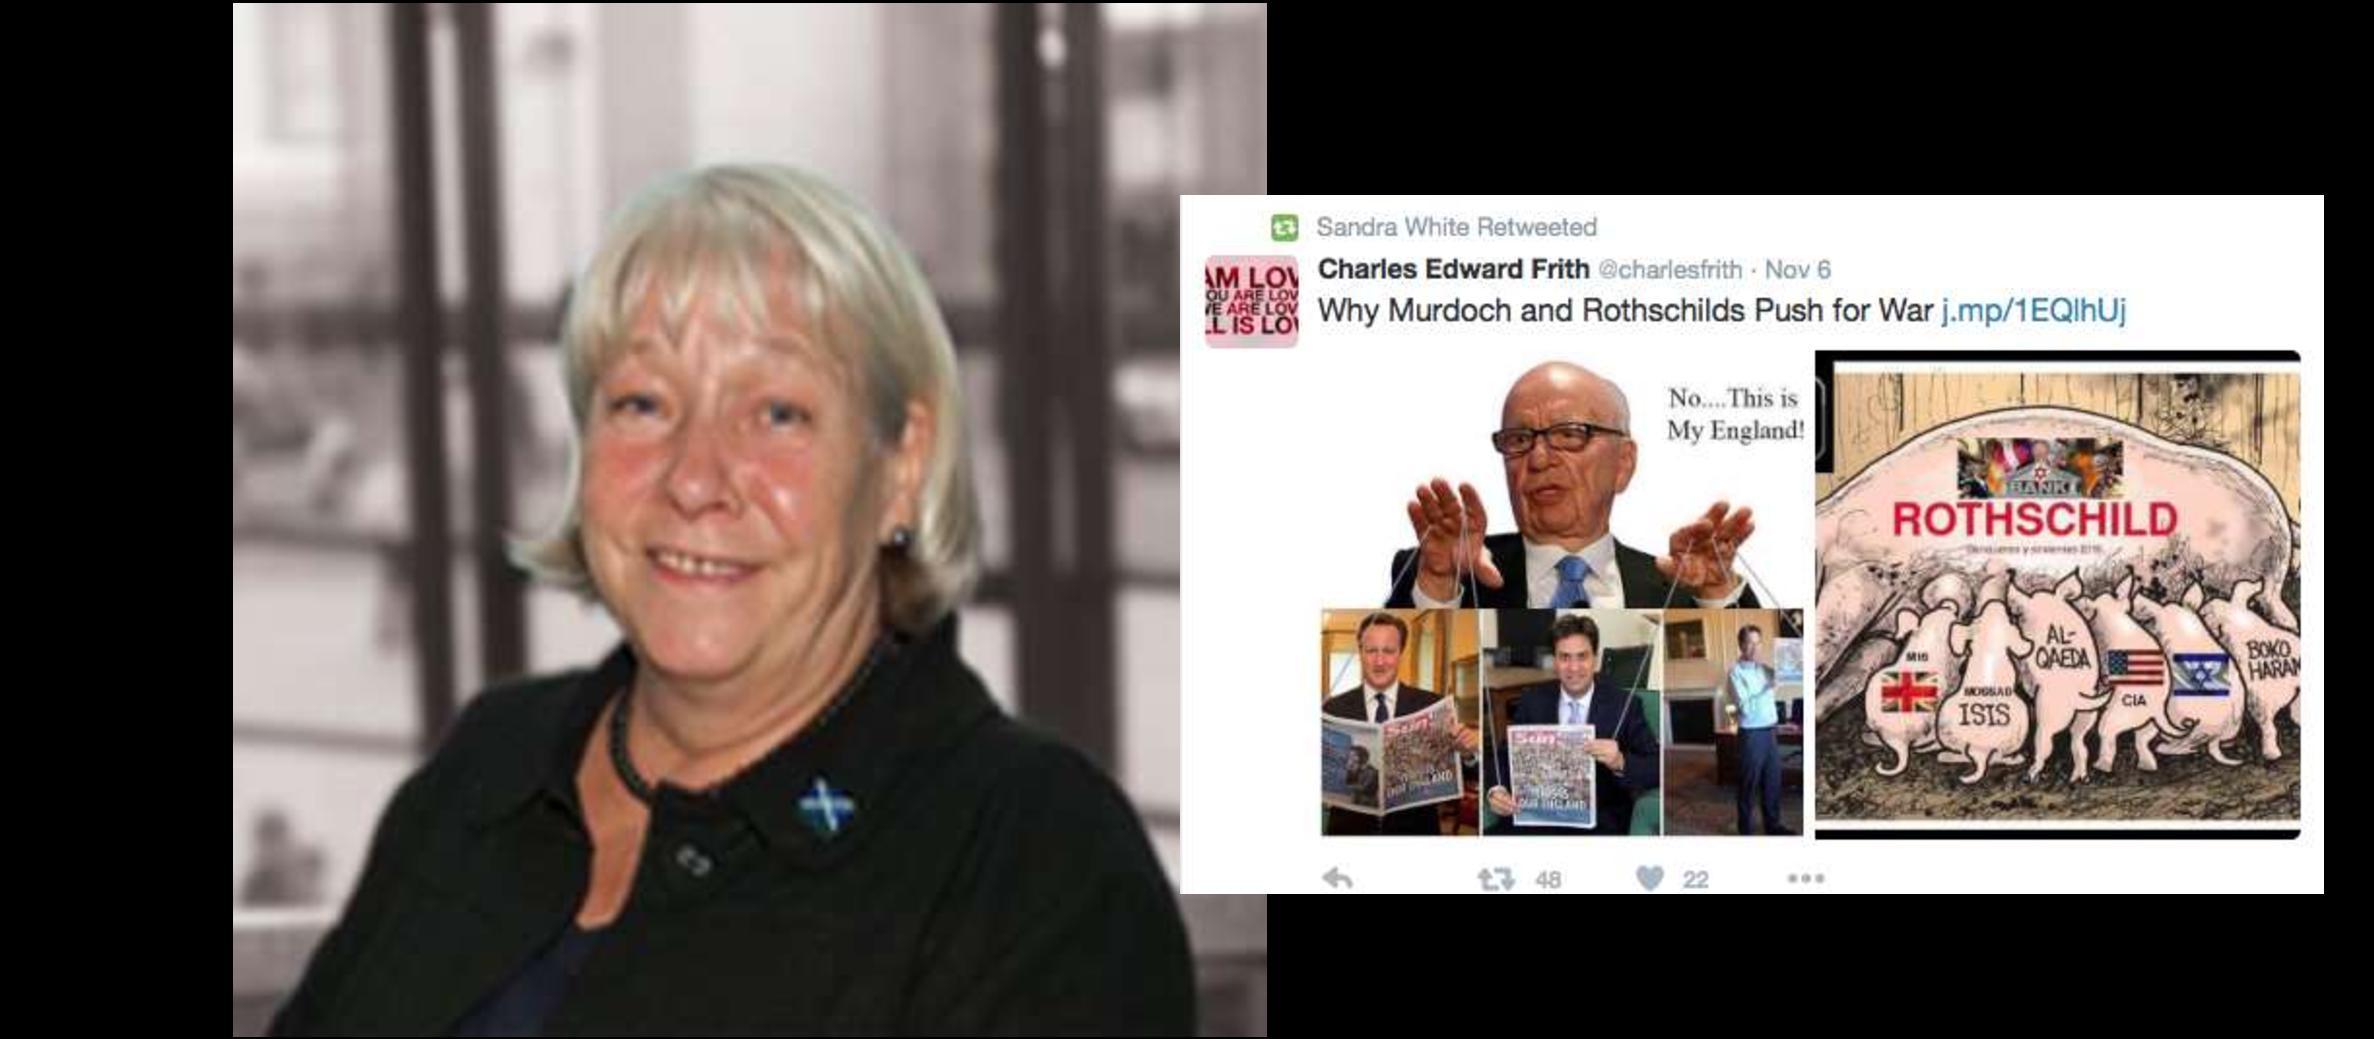 SNP politician apologised for anti-Semitic post